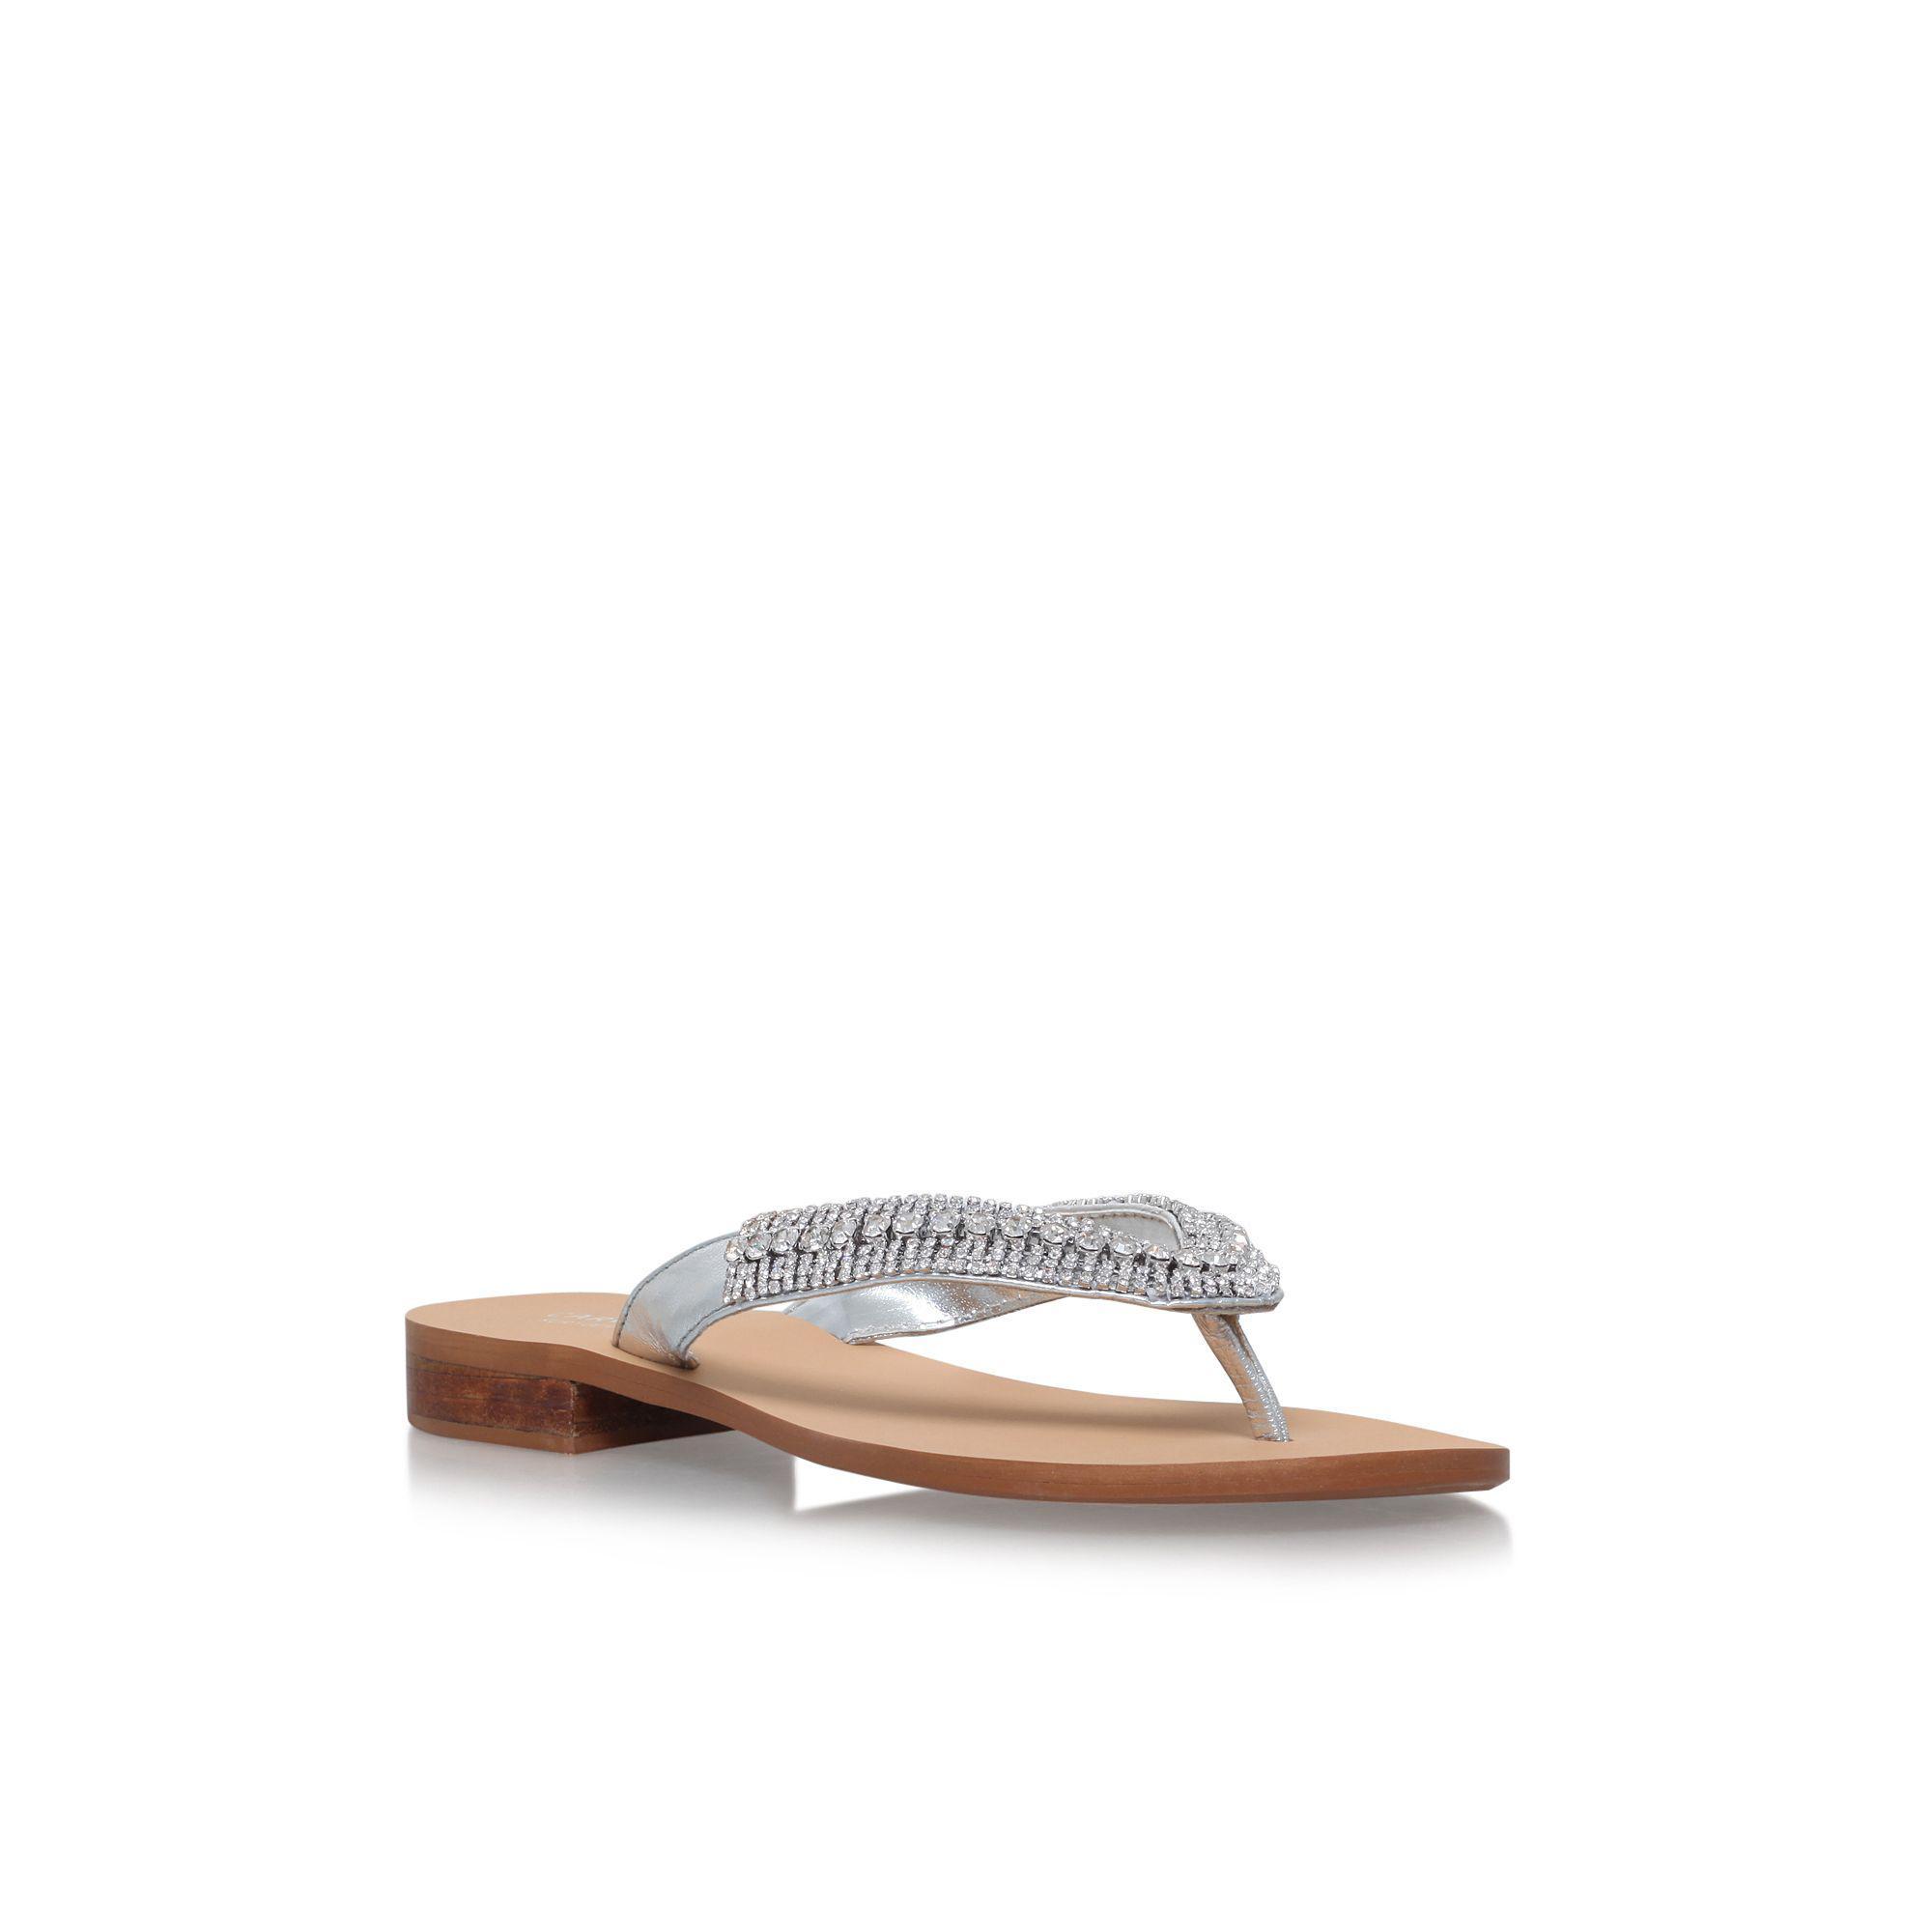 9b254e4914b Carvela Kurt Geiger Silver  breanne 2  Flat Sandals in Metallic - Lyst